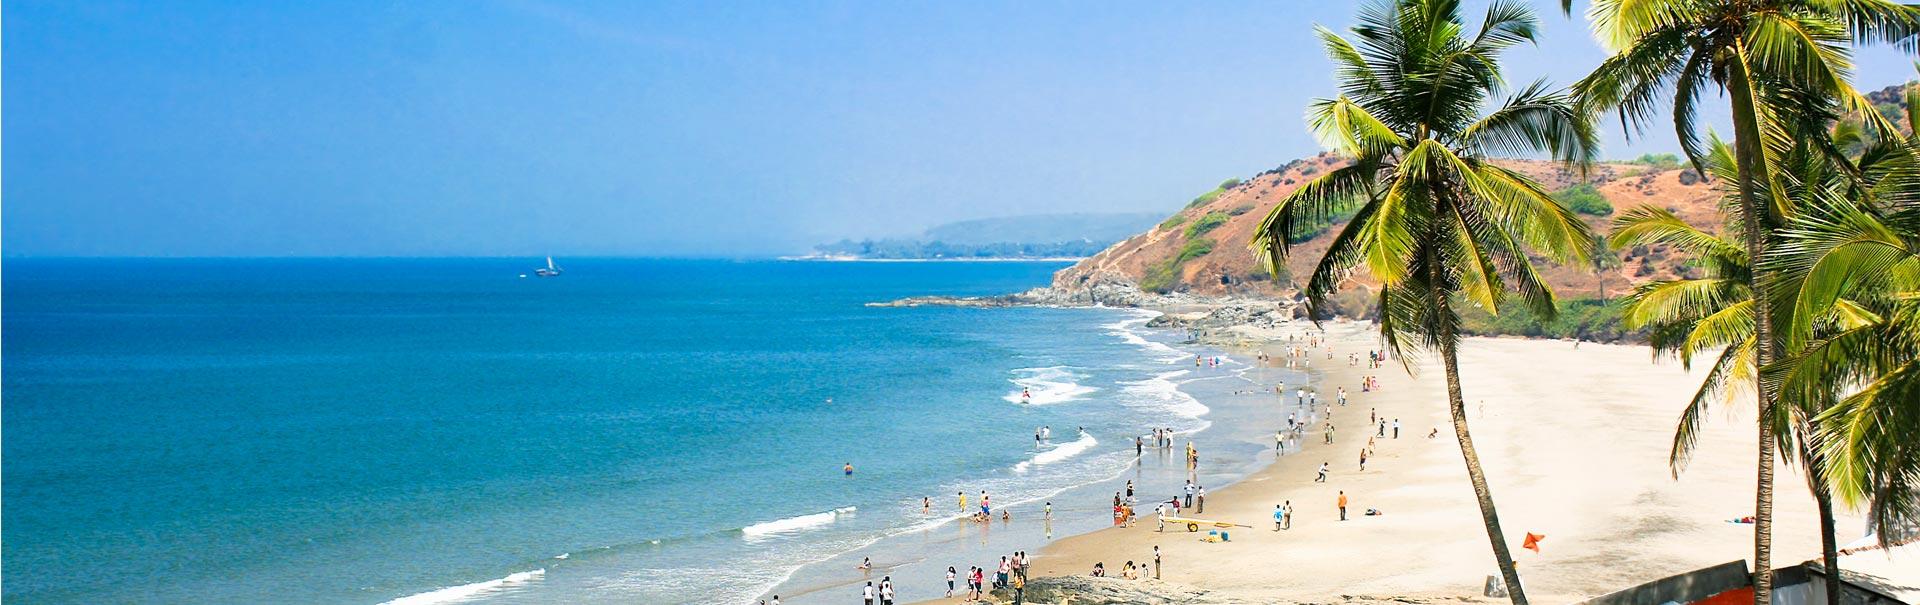 Goa with Baywatch Resort (SHGA10) Banner